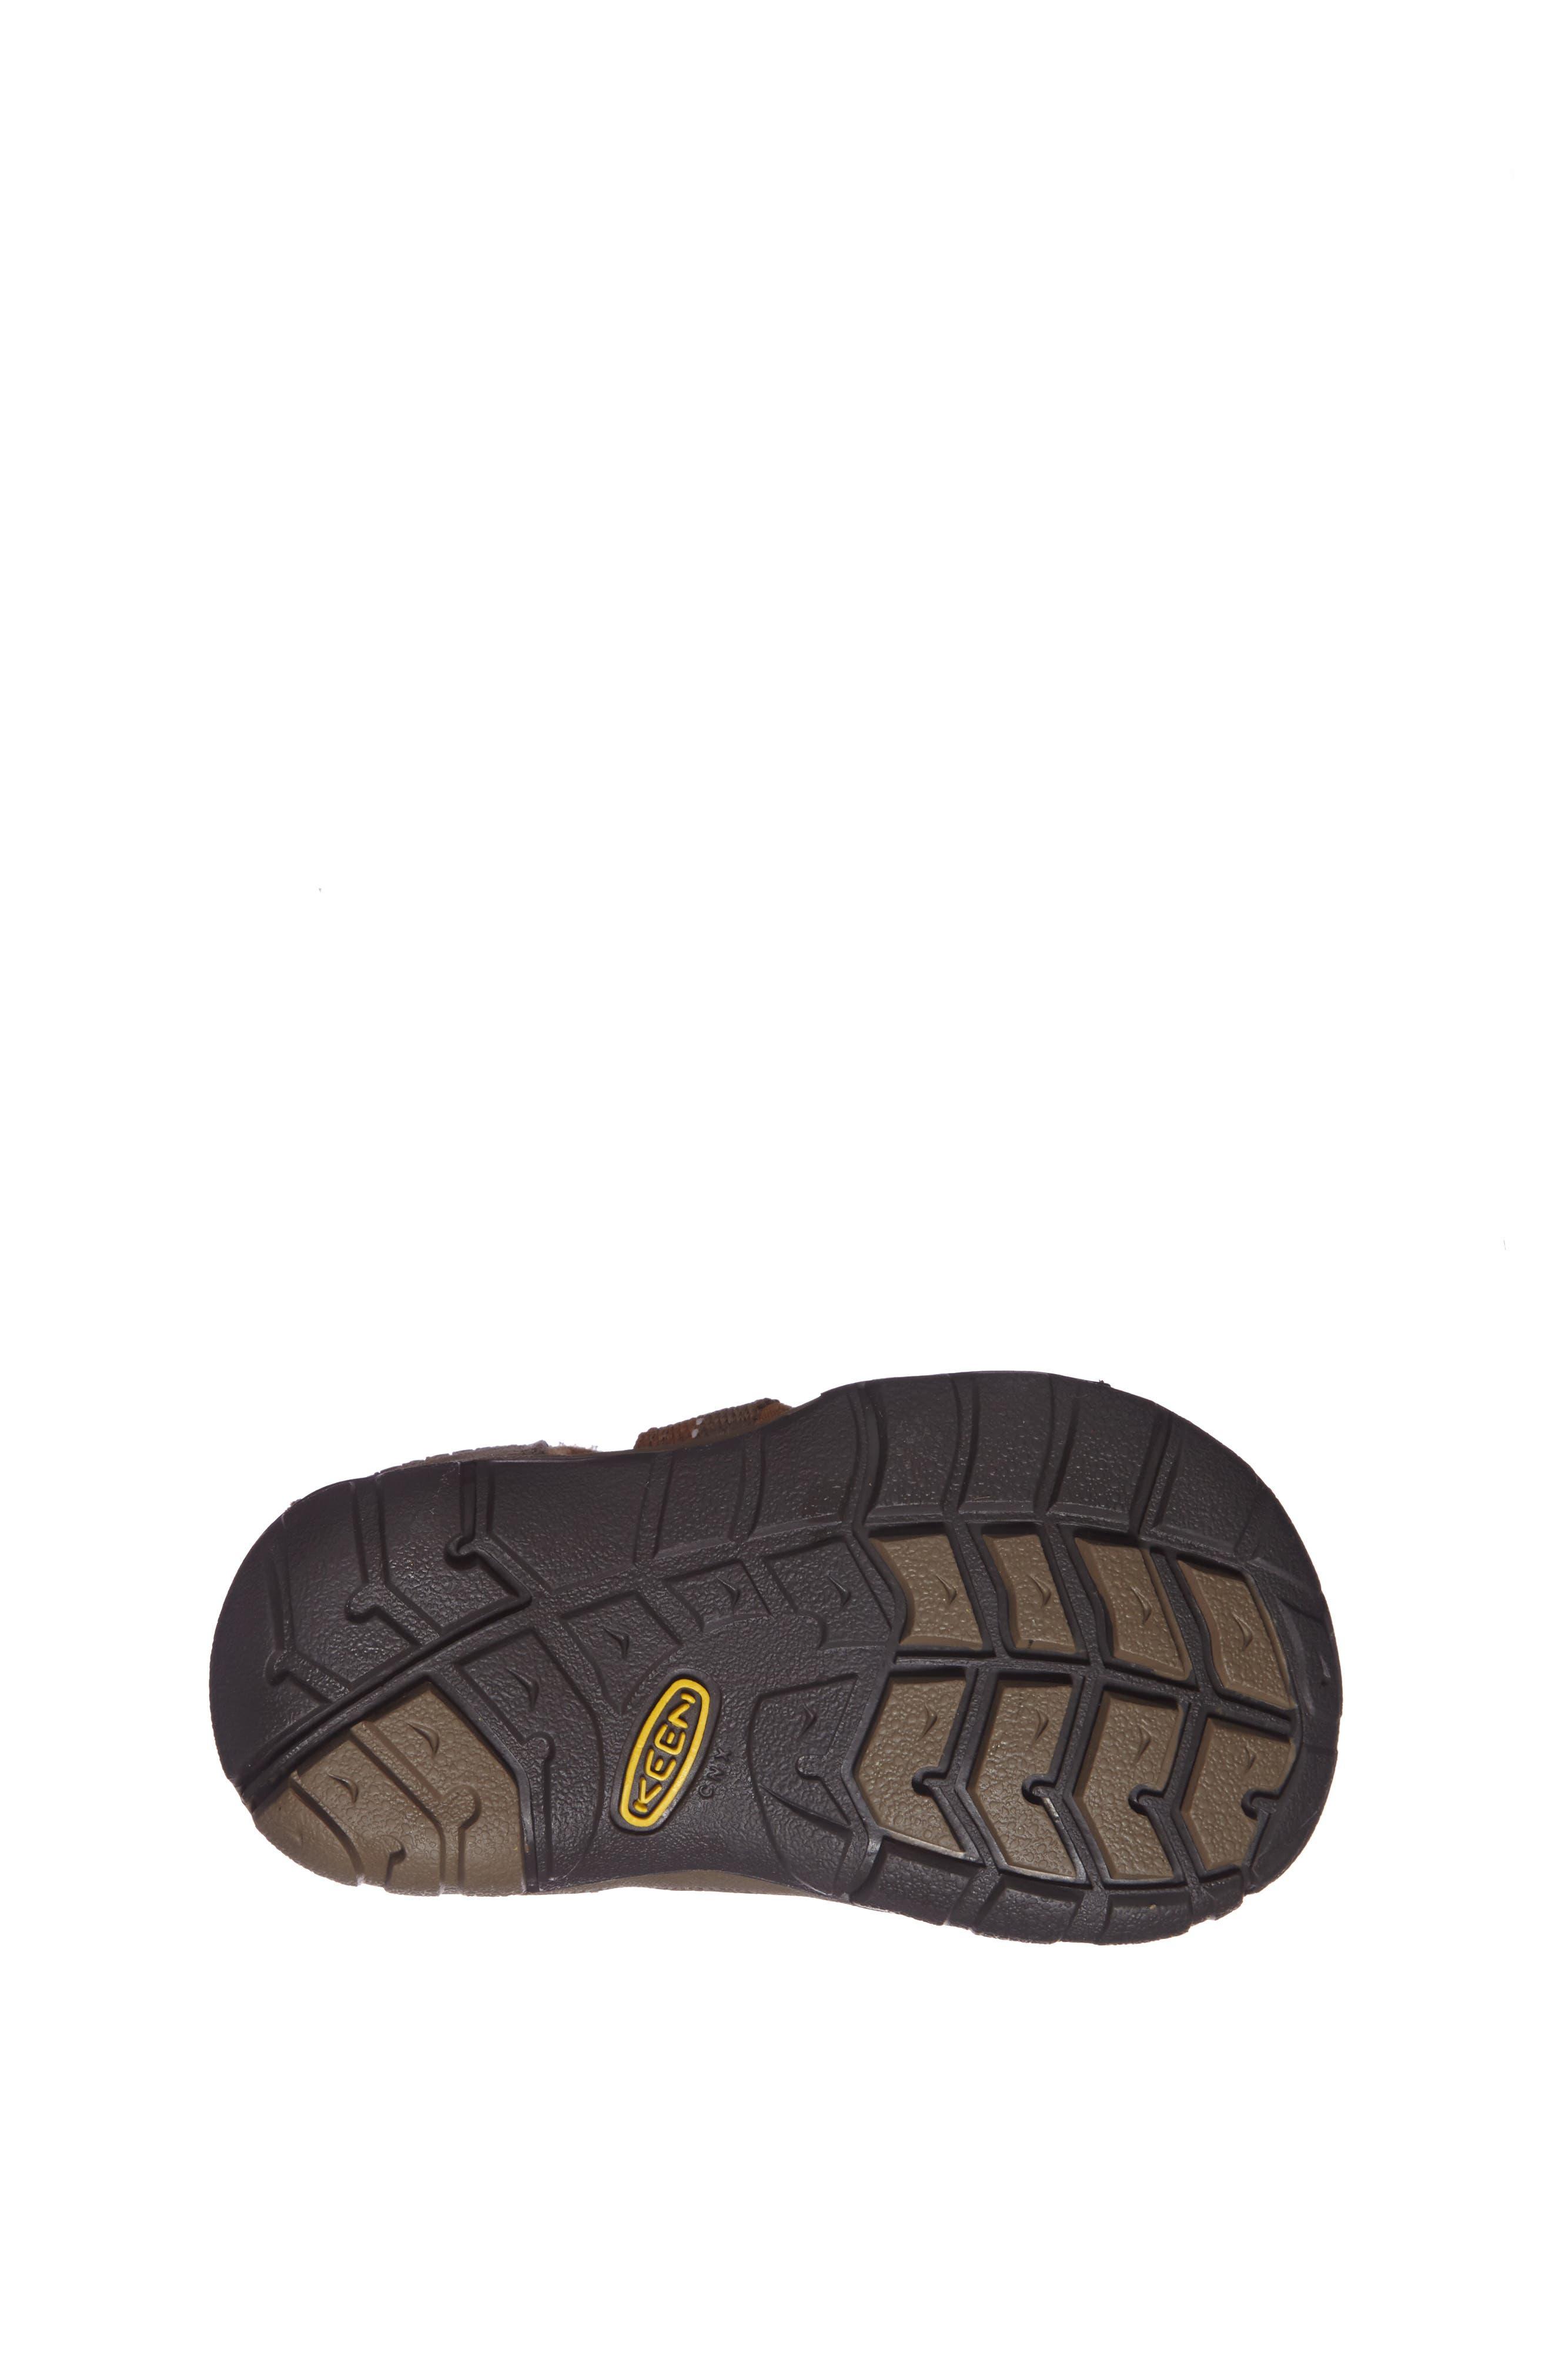 ,                             'Seacamp II' Water Friendly Sandal,                             Alternate thumbnail 126, color,                             222